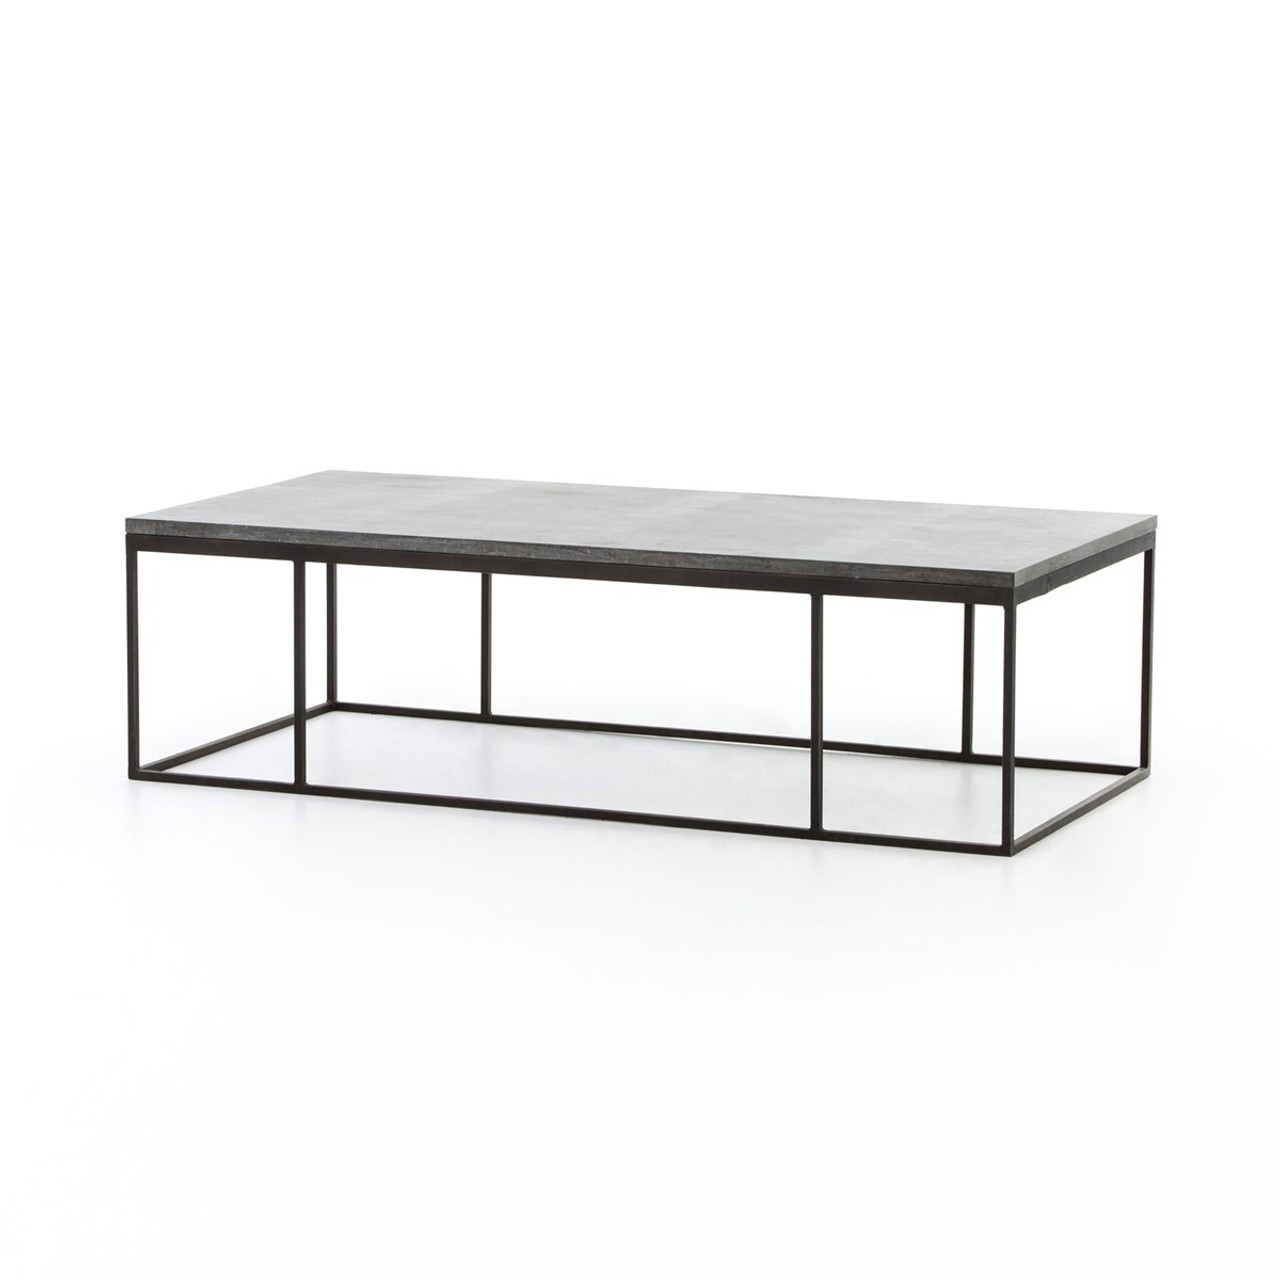 bluestone coffee table. French Industrial Iron + Bluestone Top Coffee Table F